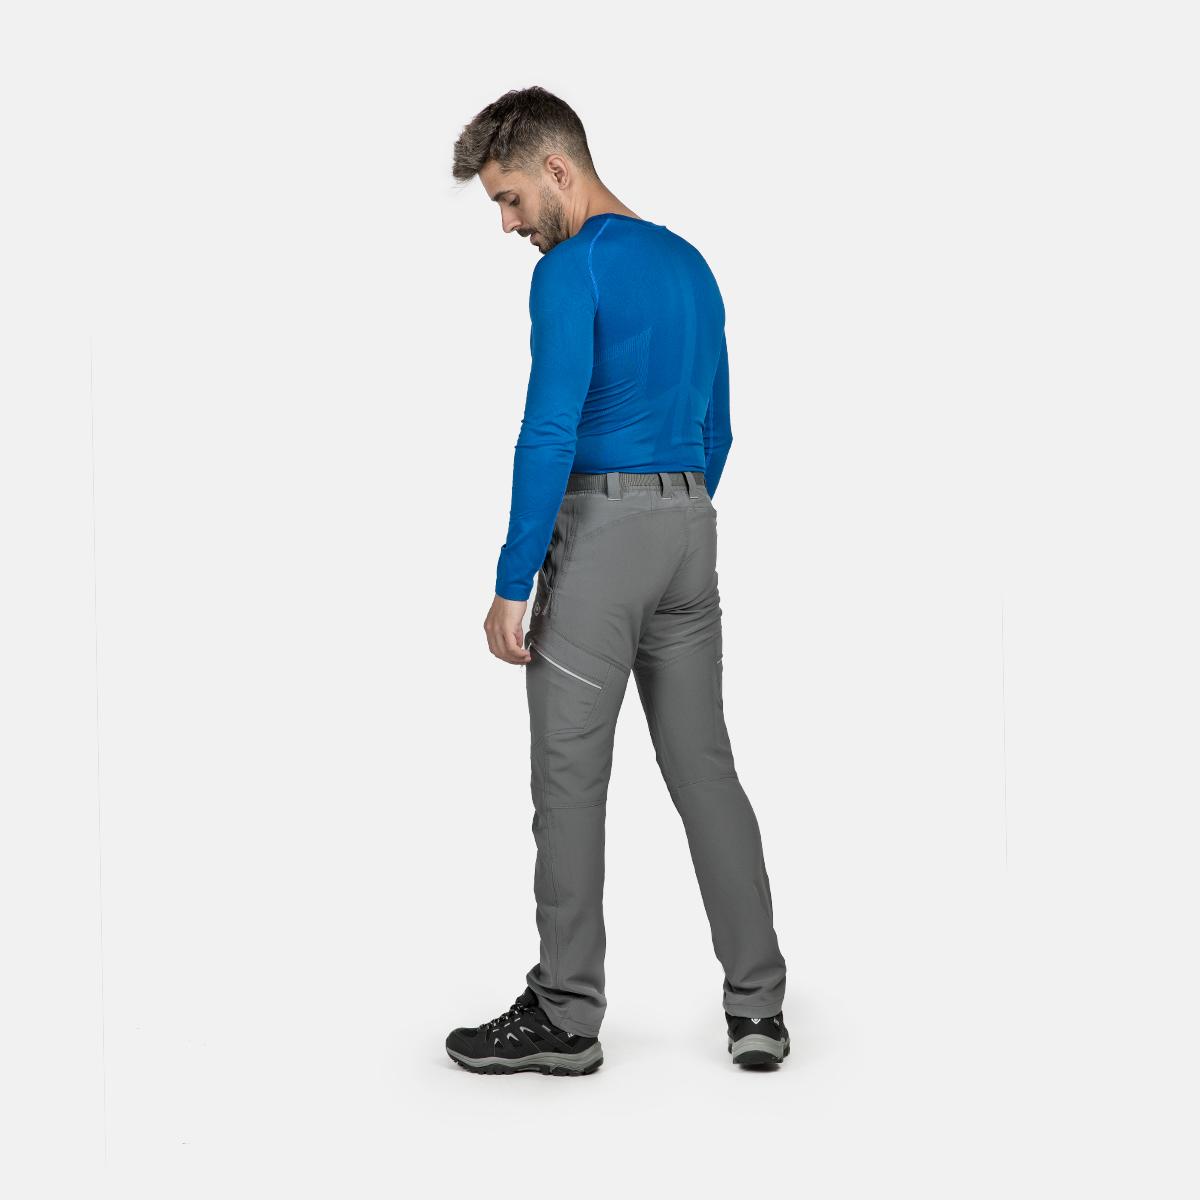 UNISEX'S SAREK THERMAL T-SHIRT BLUE